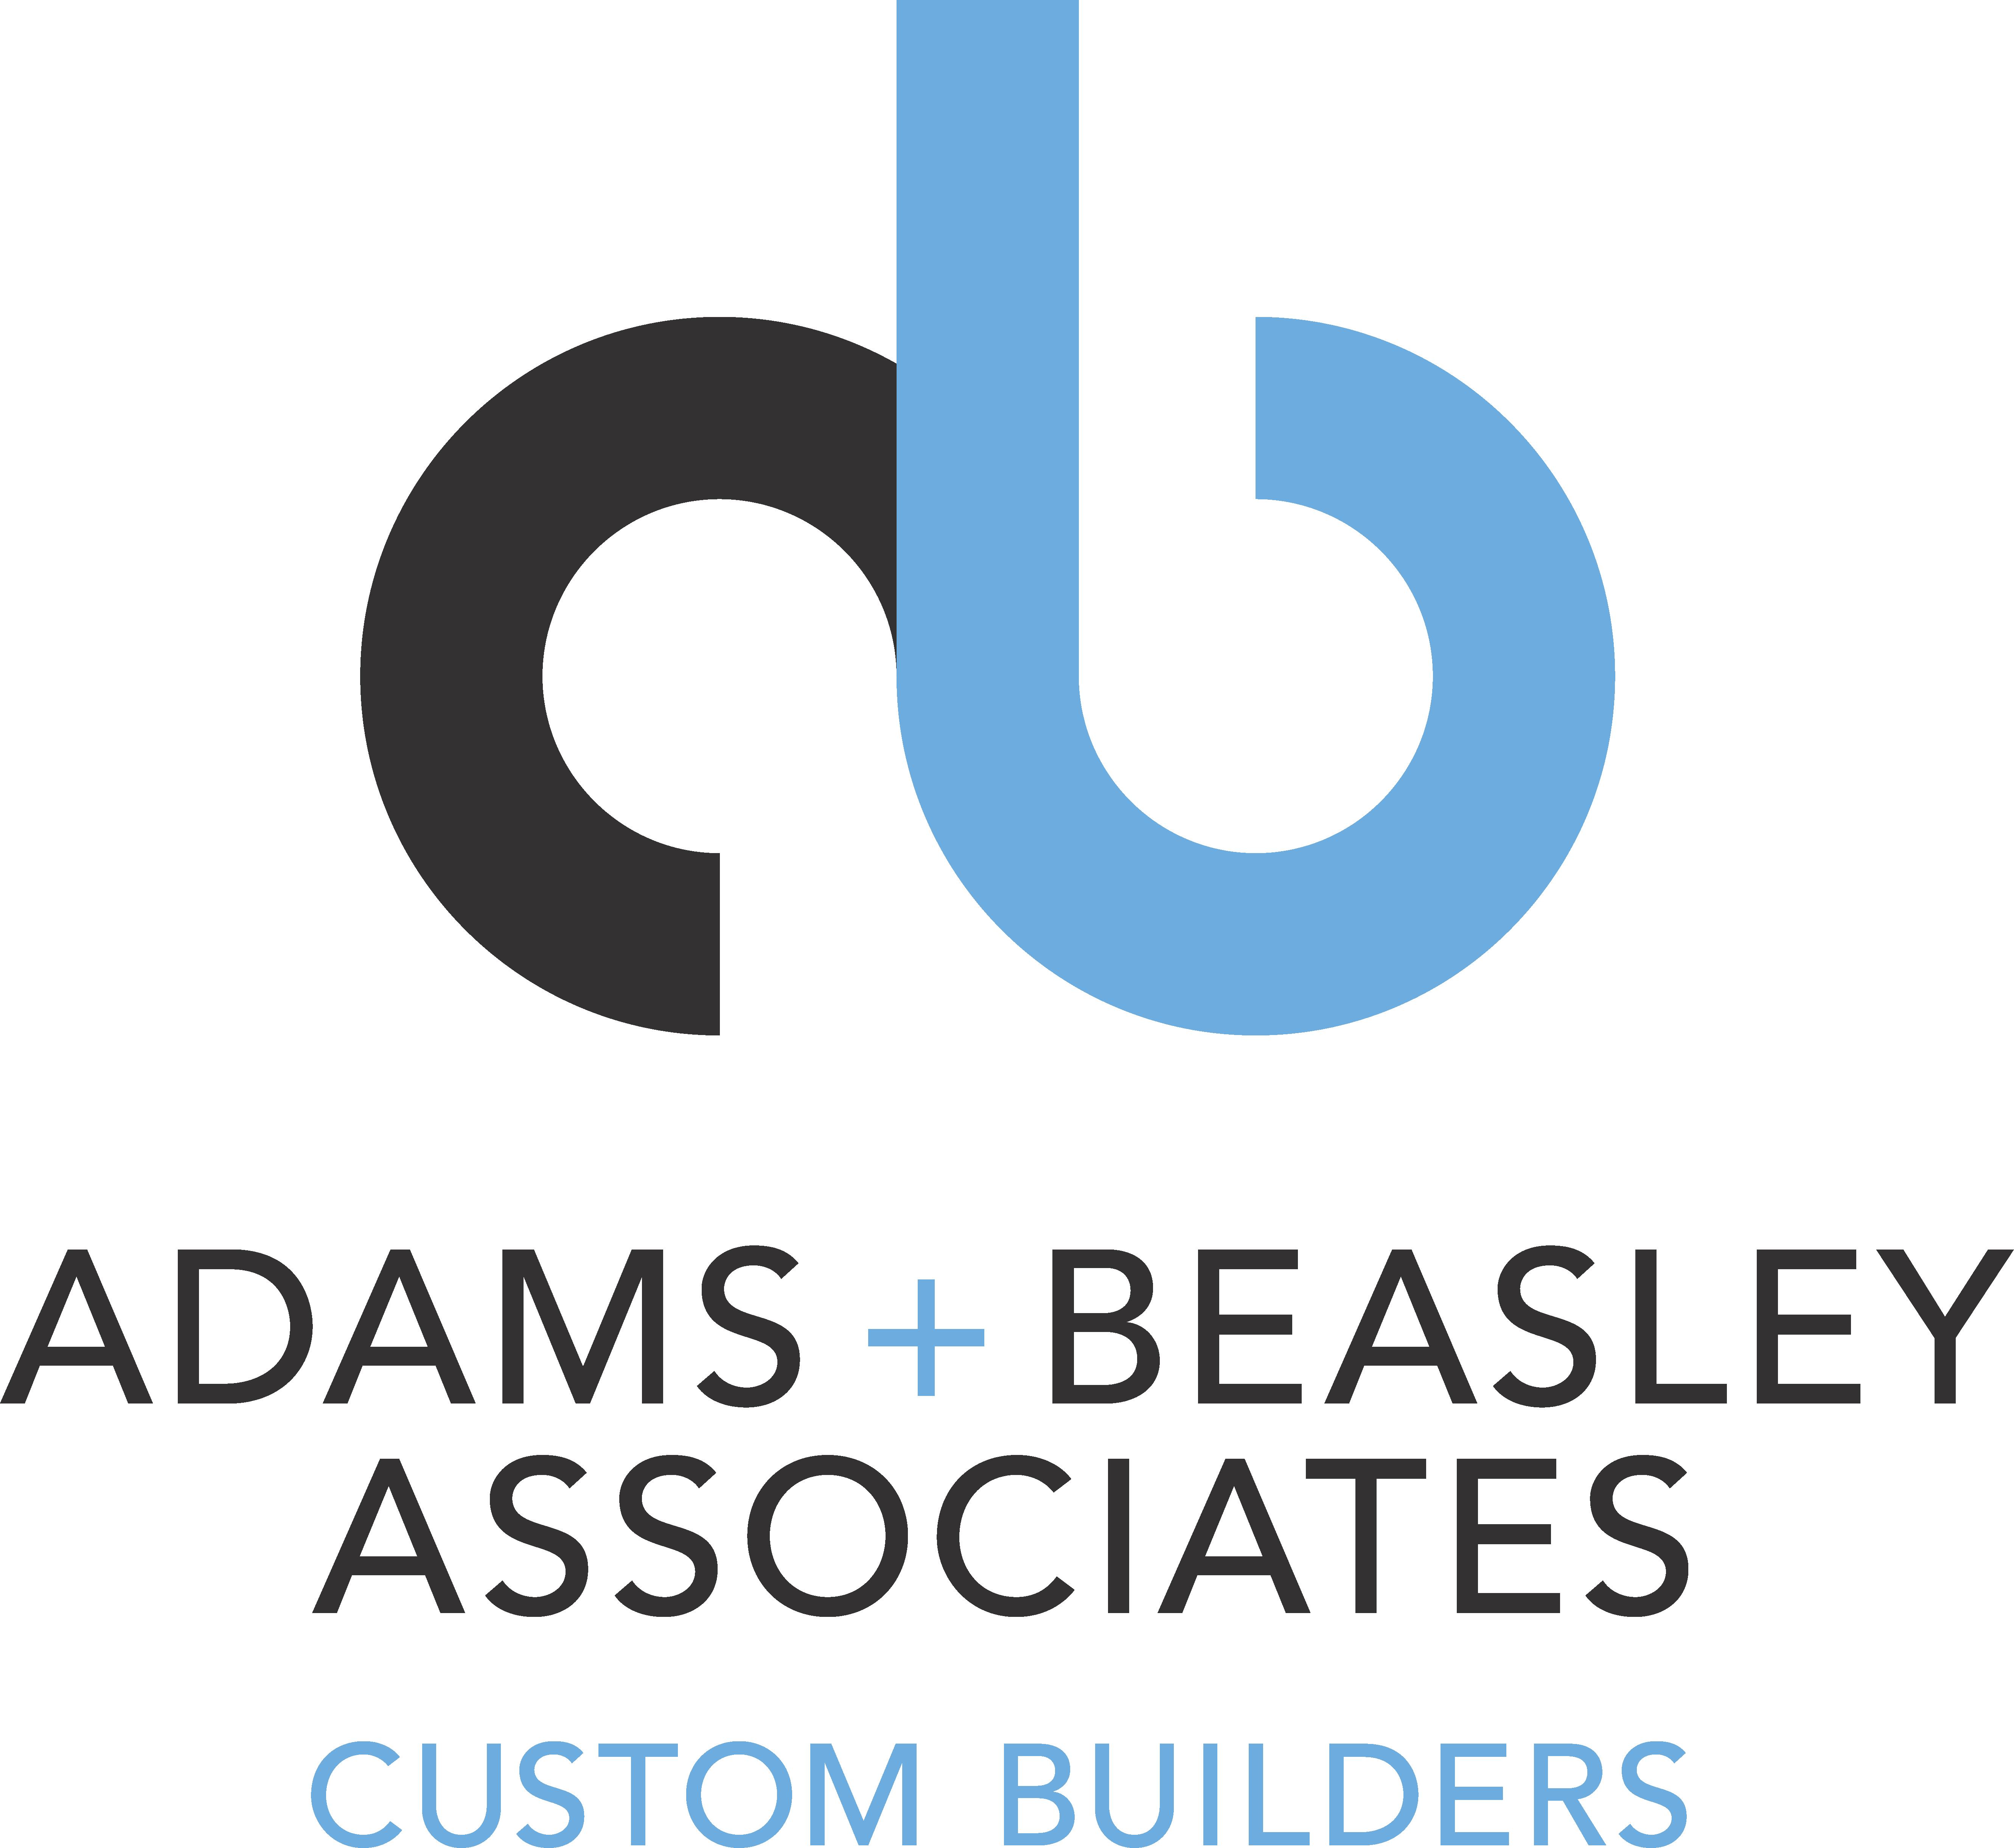 Adams + Beasley Associates logo